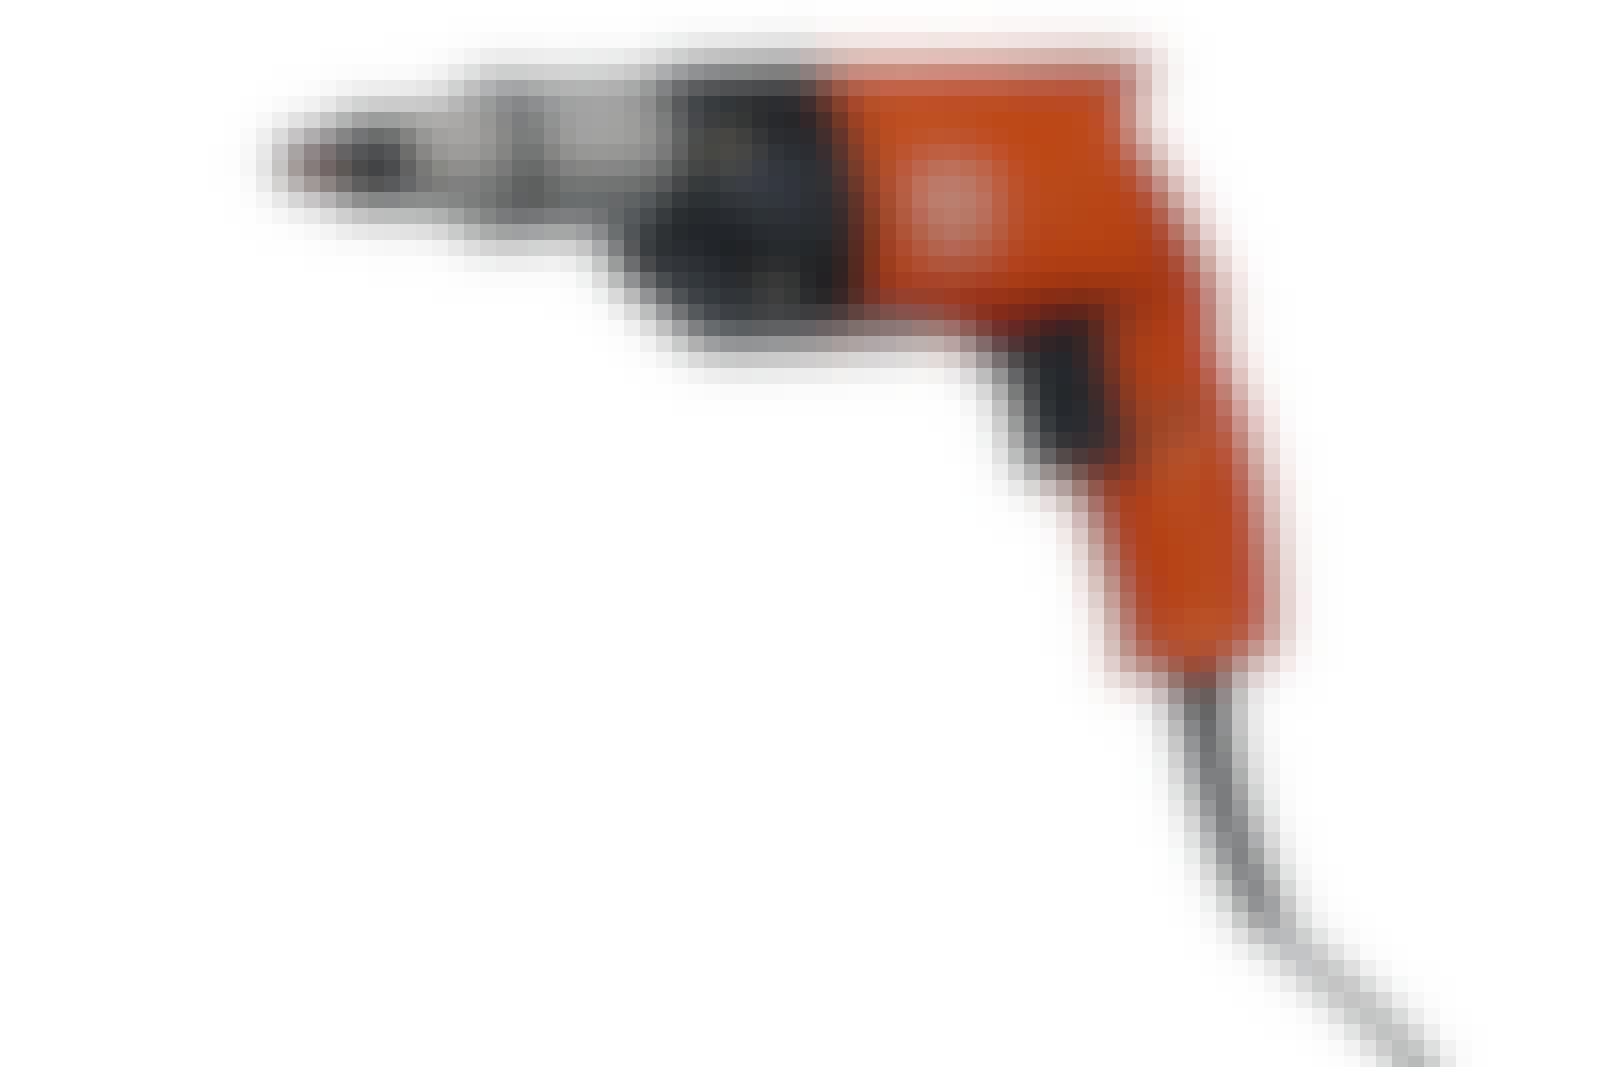 Gipsskruemaskine slipper sit tag i skruen